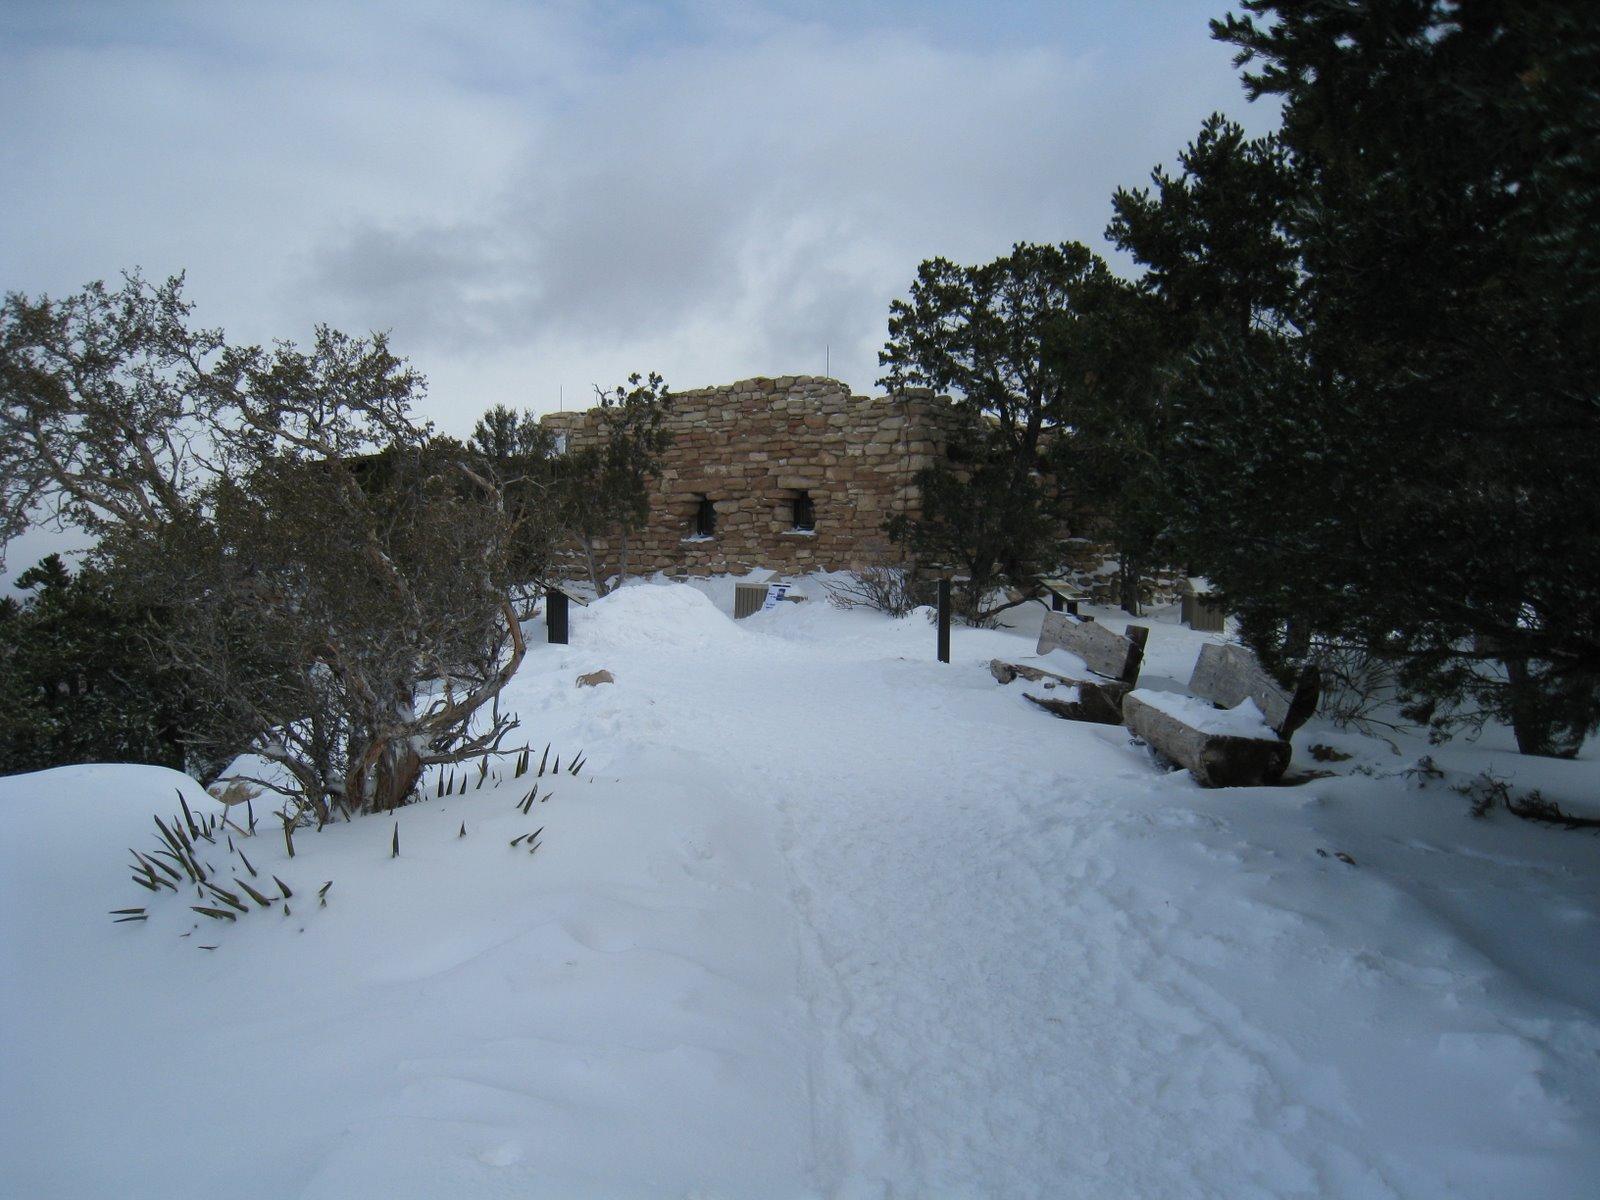 The Yavapai Observation Station